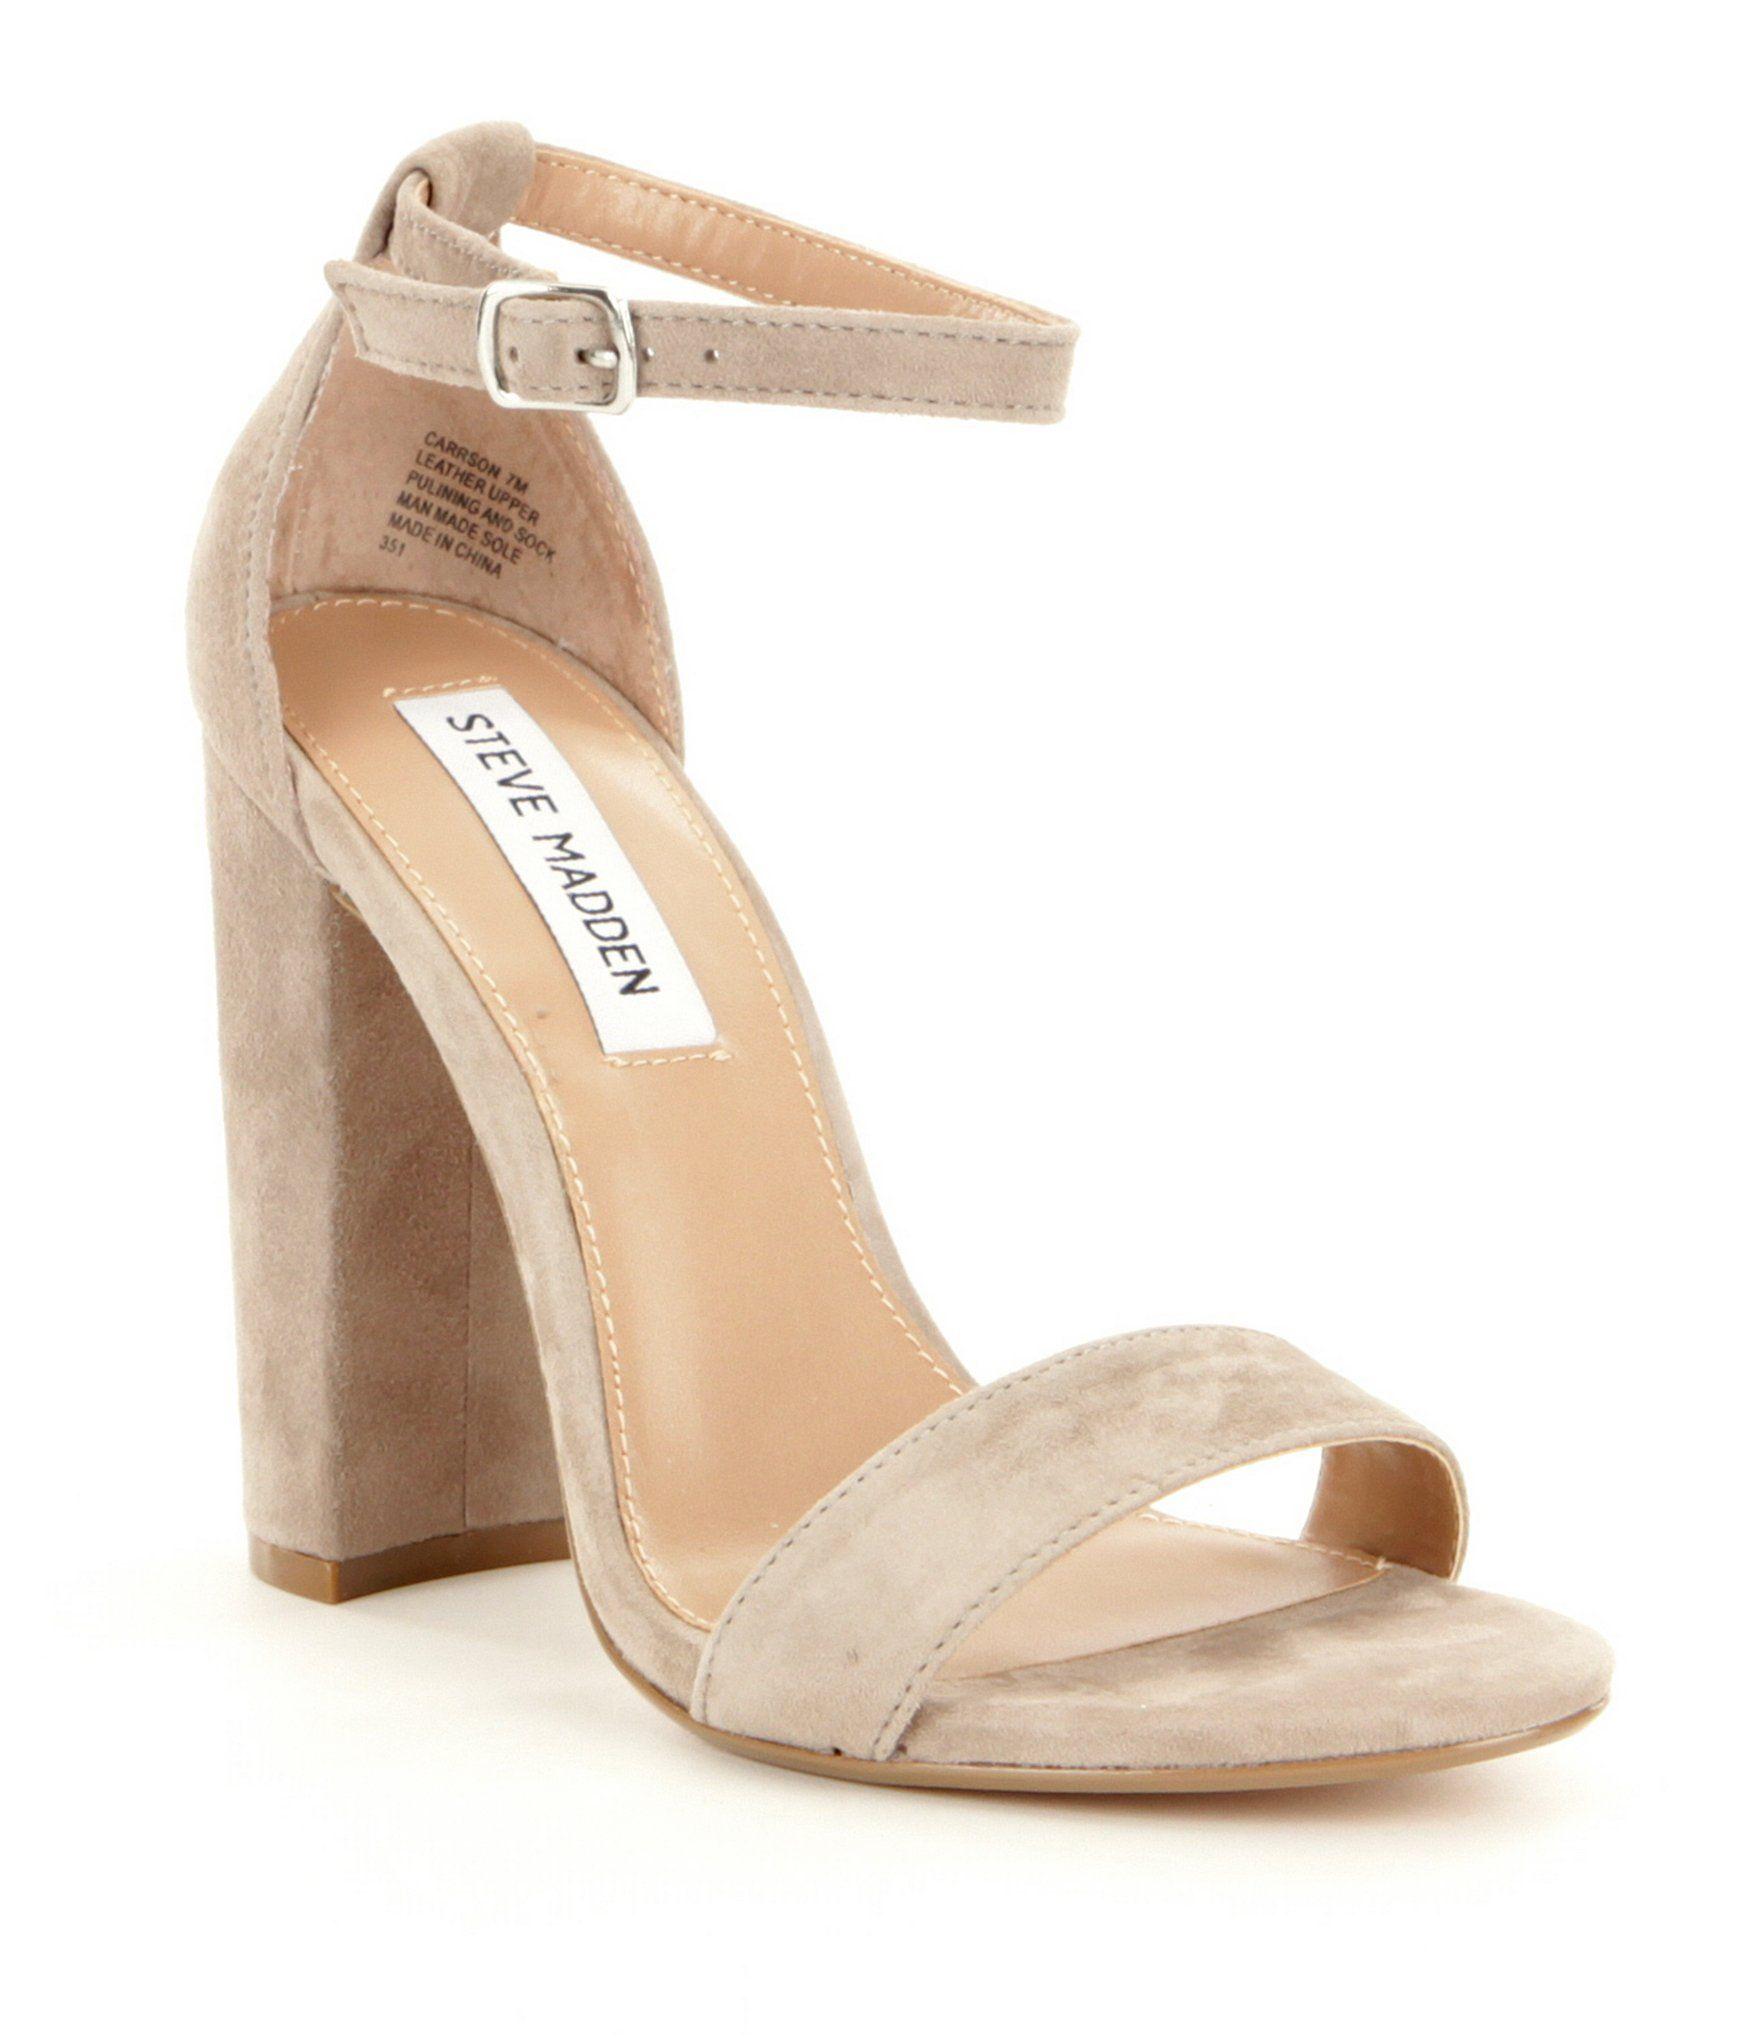 404d9e4377f1c Steve Madden Carrson Suede Ankle Strap Block Heel Dress Sandals  Dillards